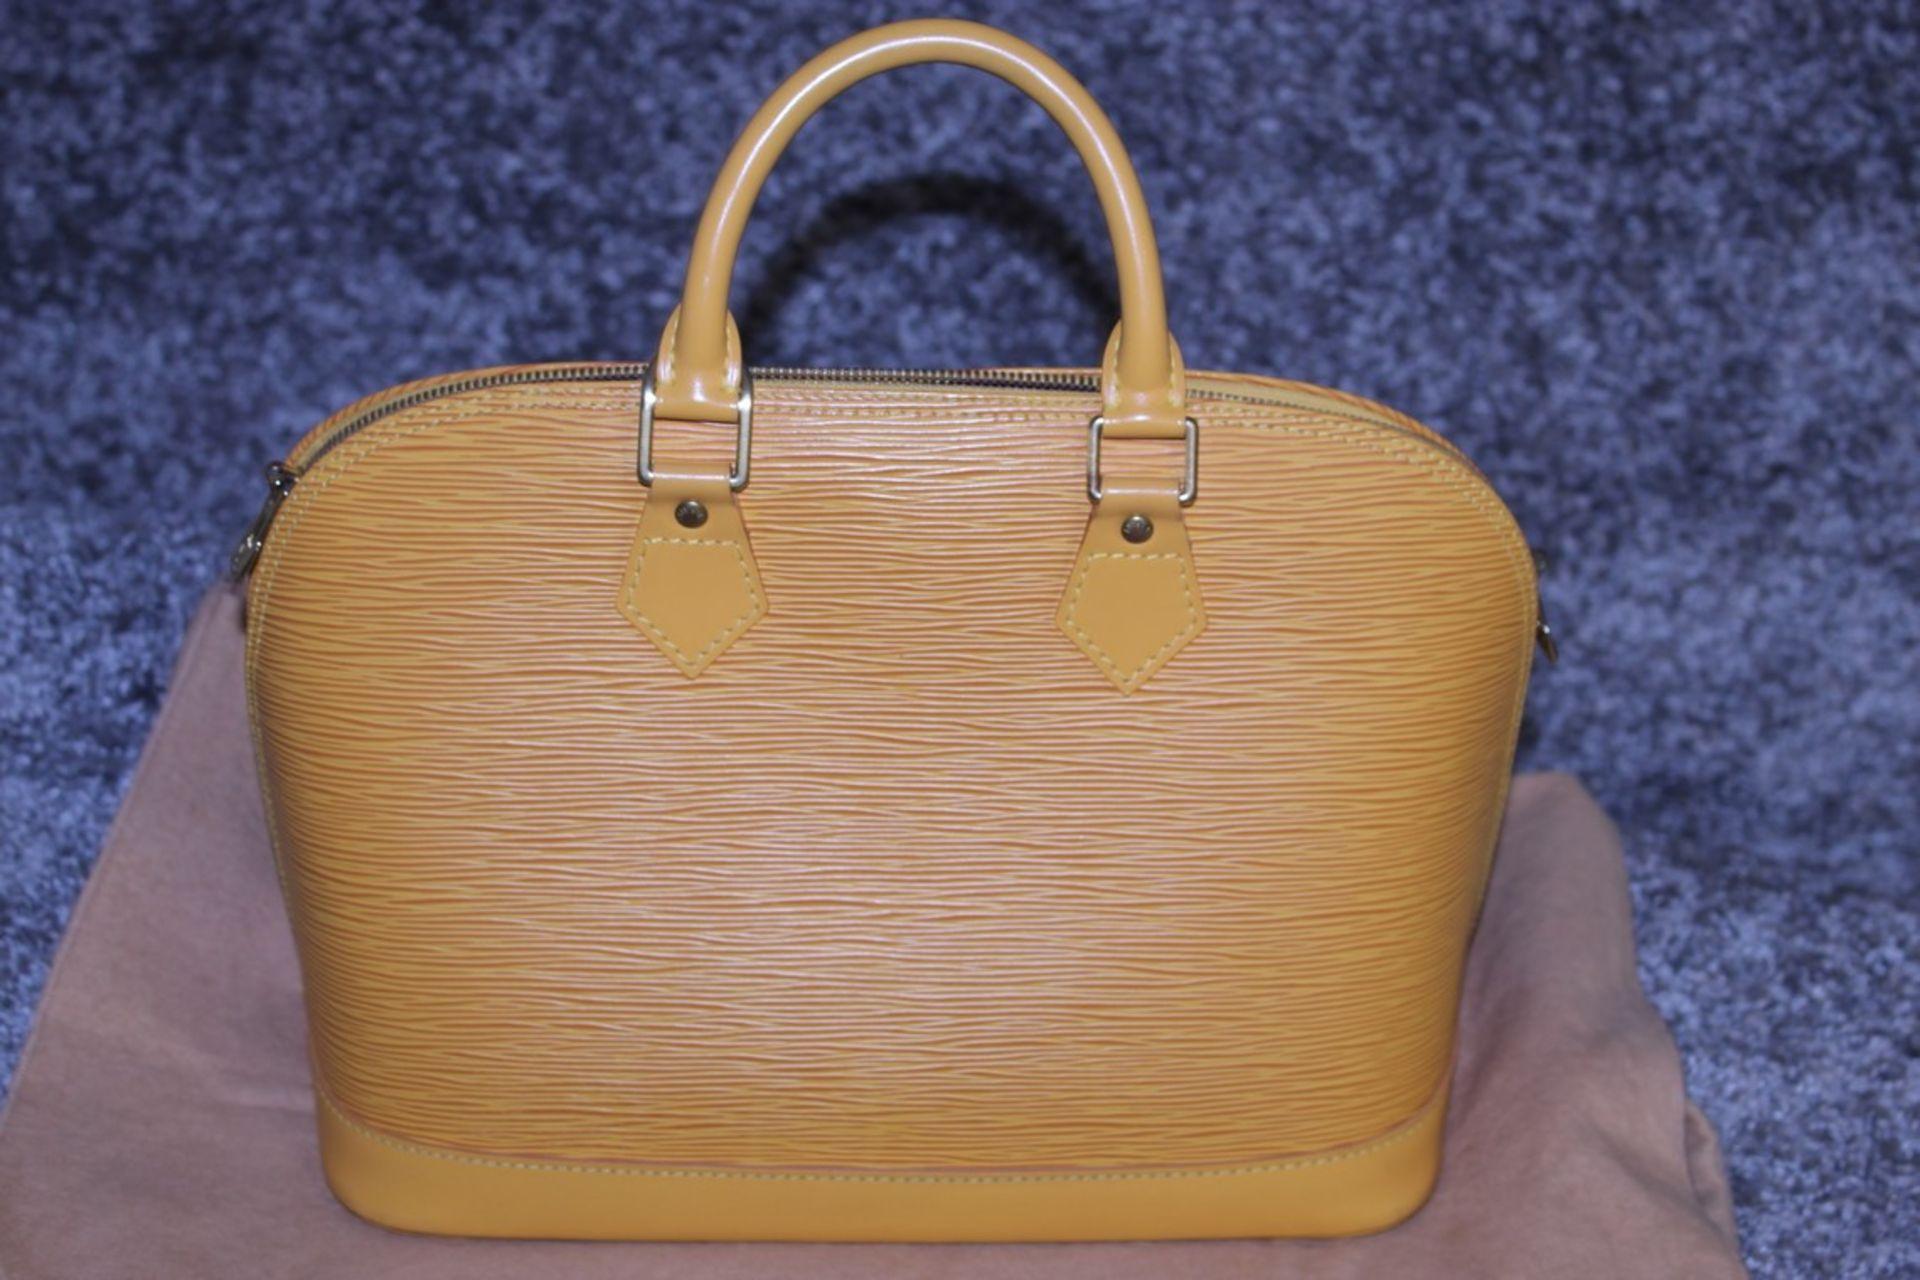 RRP £1,700 Louis Vuitton Alma Yellow Calf Epi Leather Handbag, Complete With Cadena, Keys & Dust Bag - Image 2 of 4